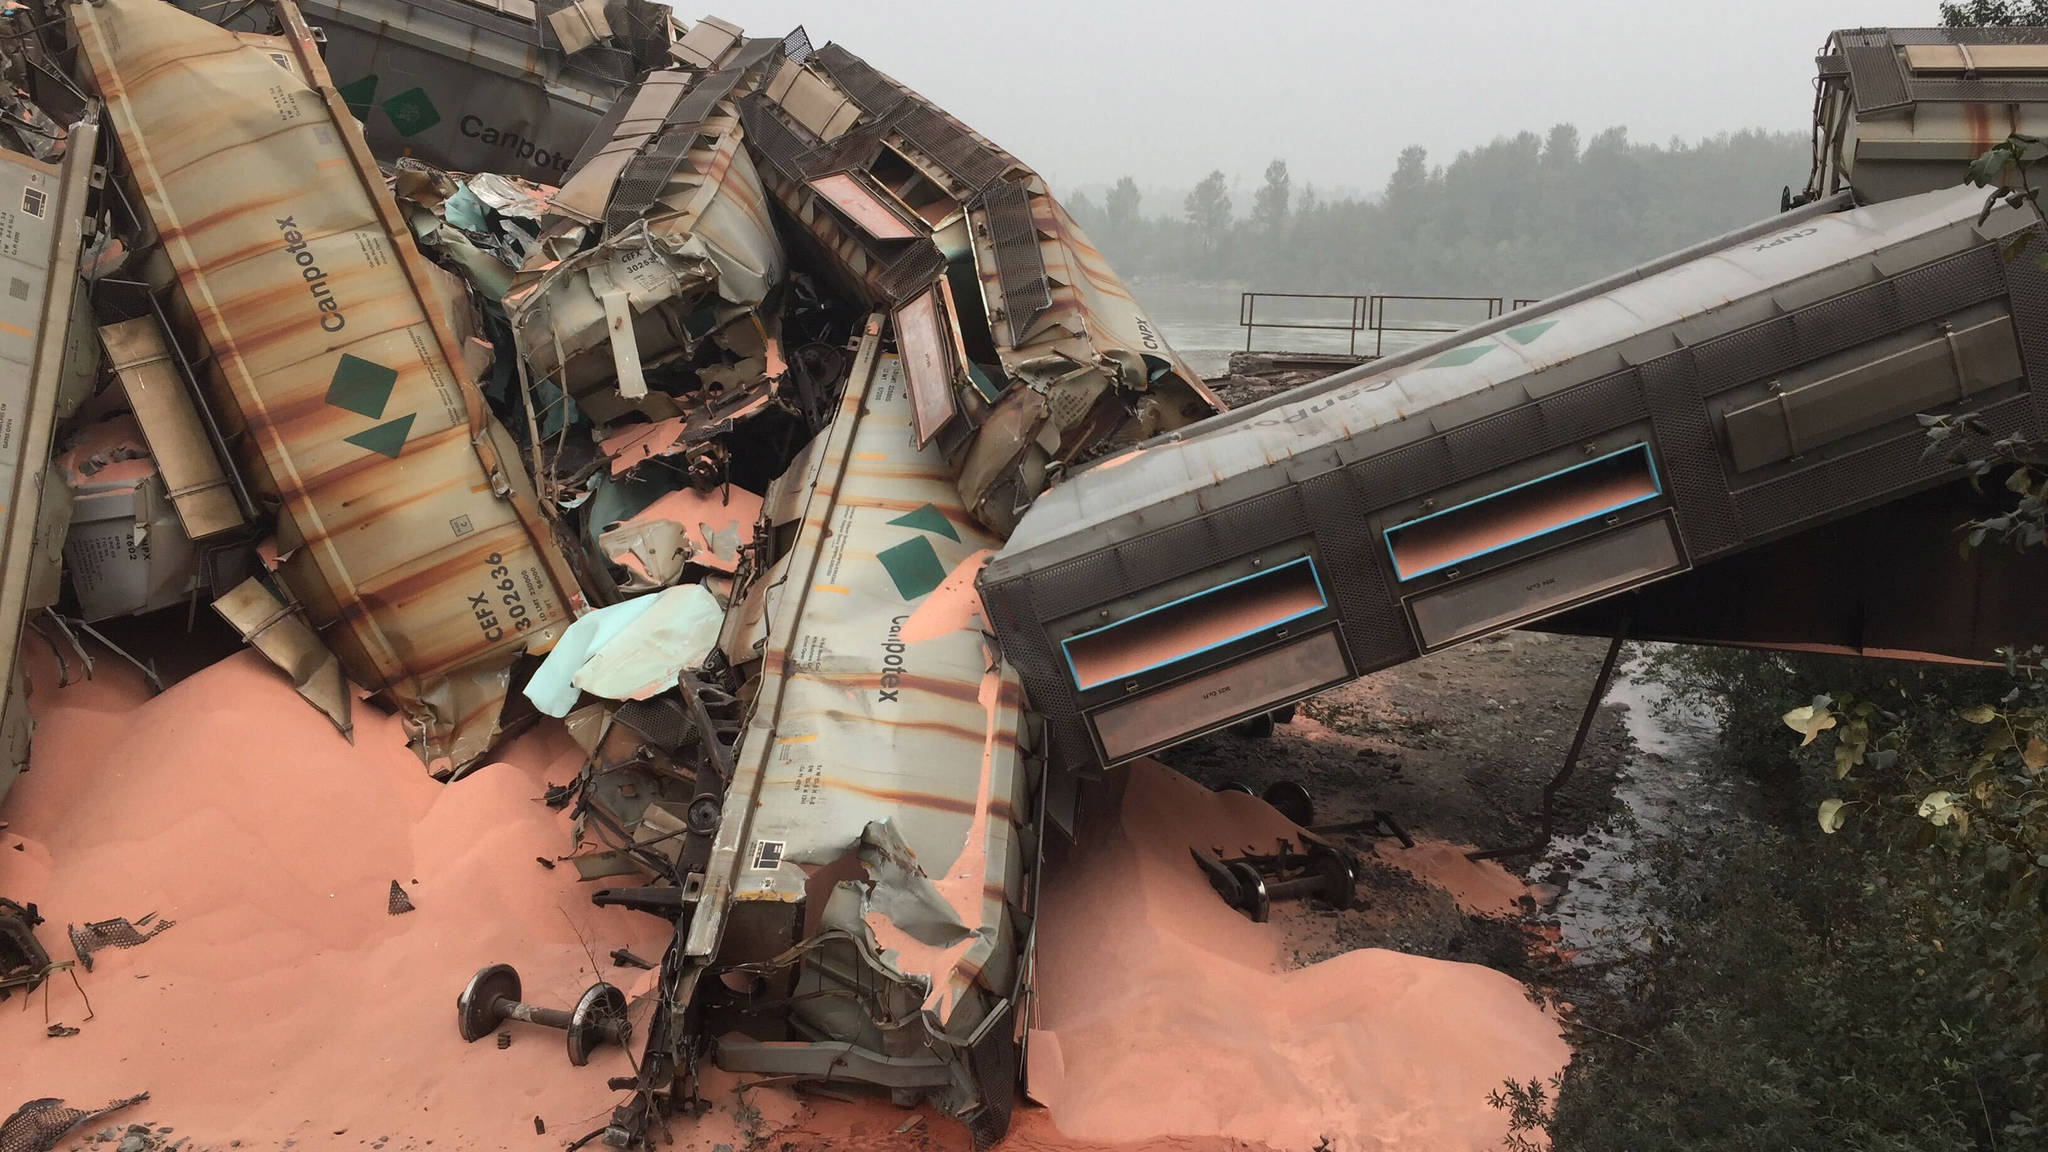 Crews are working to clean up a CN Rail derailment near Hope involving 20 rail cars carrying potash. (Emelie Peacock/Hope Standard)